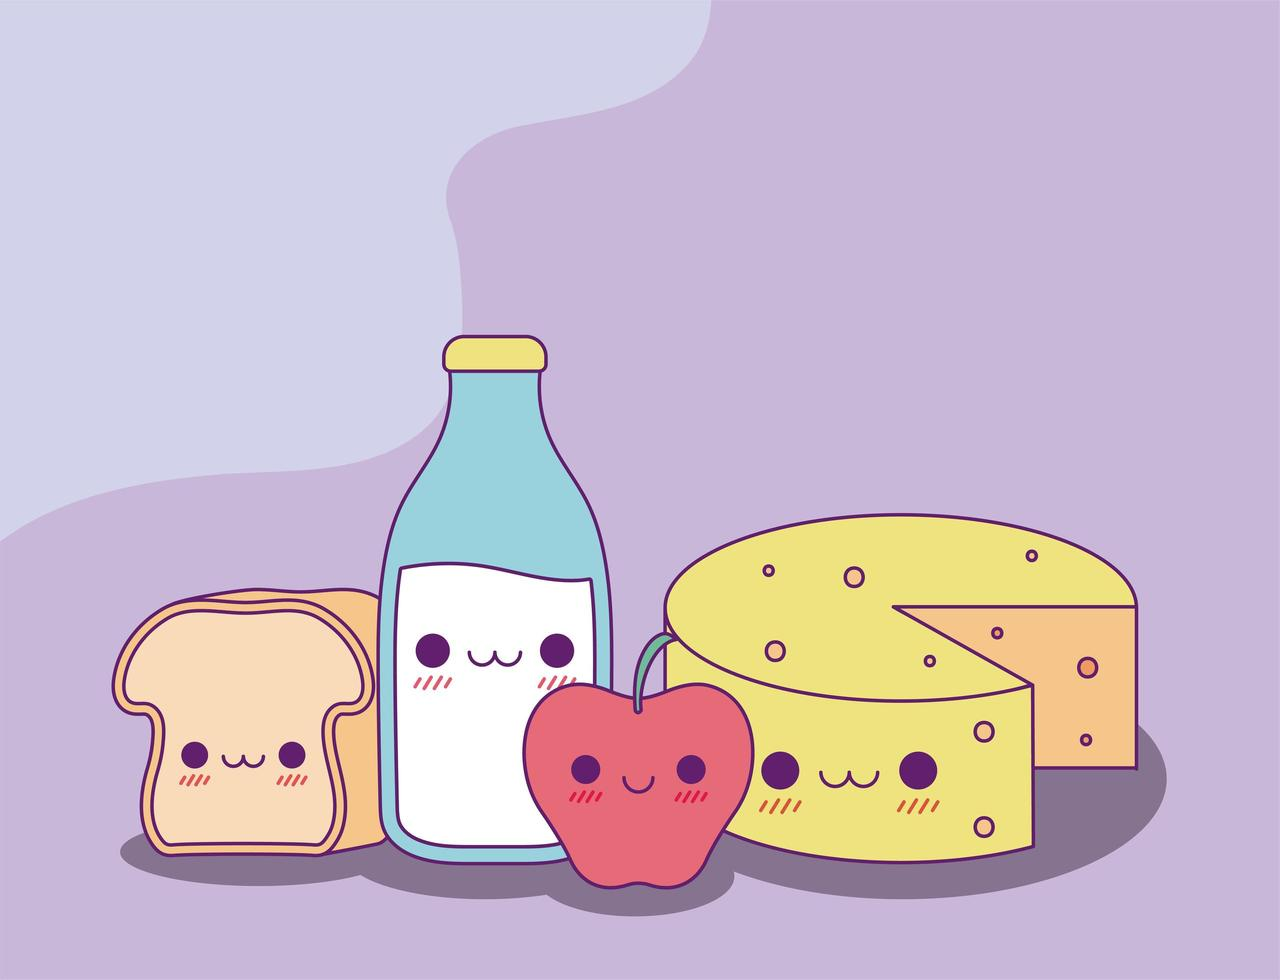 kawaii Brot Milchflasche Apfel und Käse Vektor-Design vektor